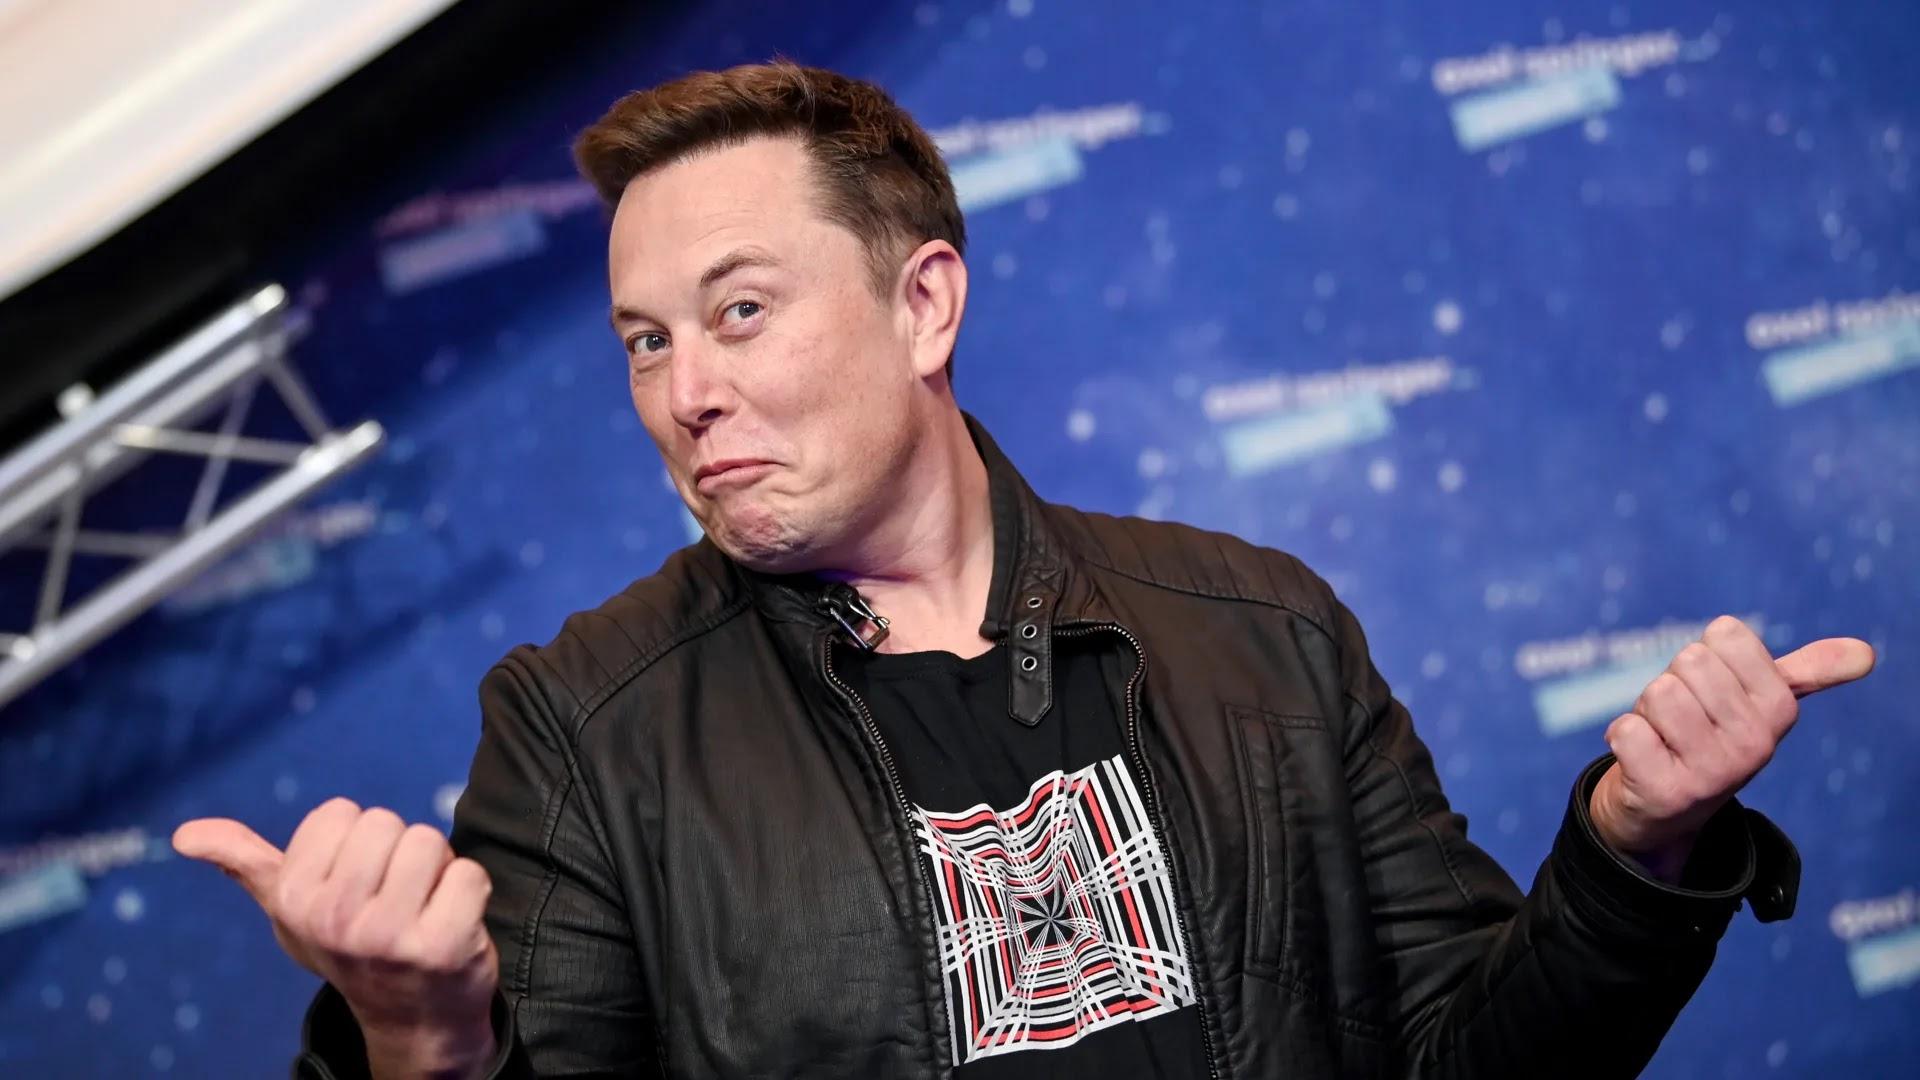 Elon Musk menyangkal bahwa kecelakaan mobil Tesla akibat fitur Auto Pilot